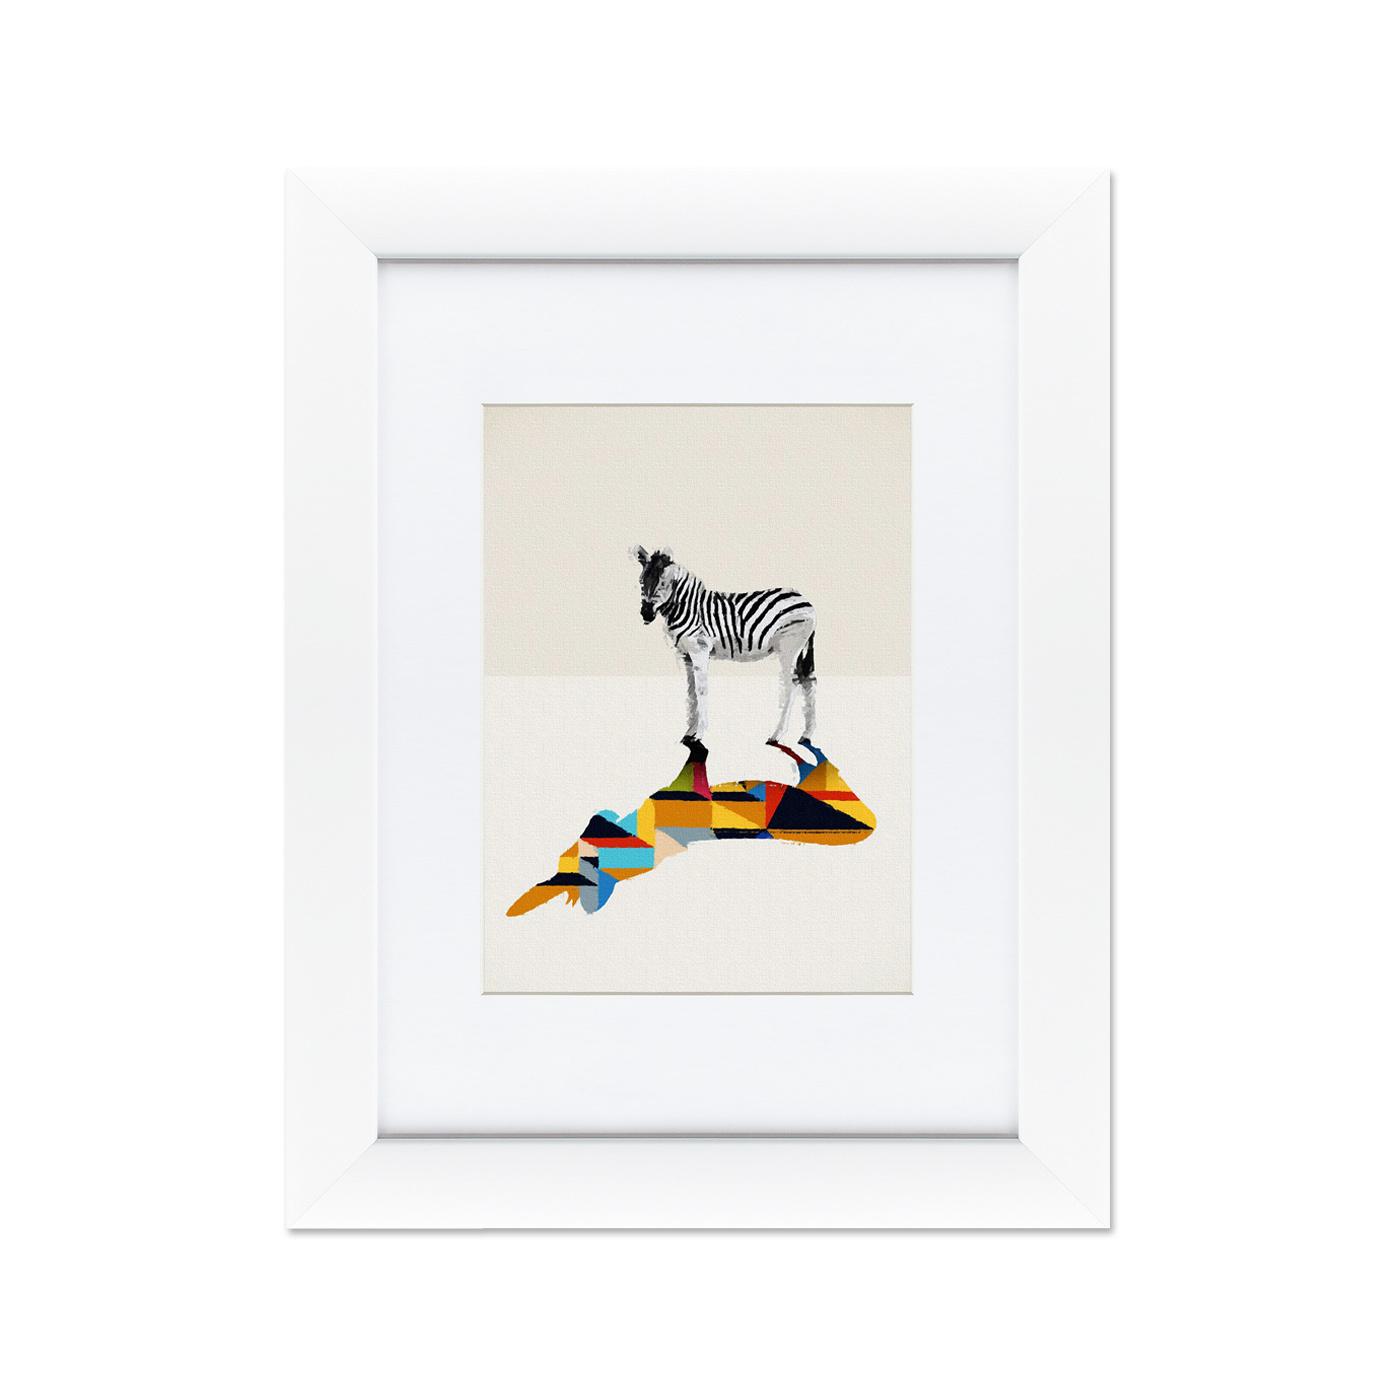 {} Картины в Квартиру Картина Зебра (35х45 см) картины в квартиру картина геометрия света 2 35х45 см